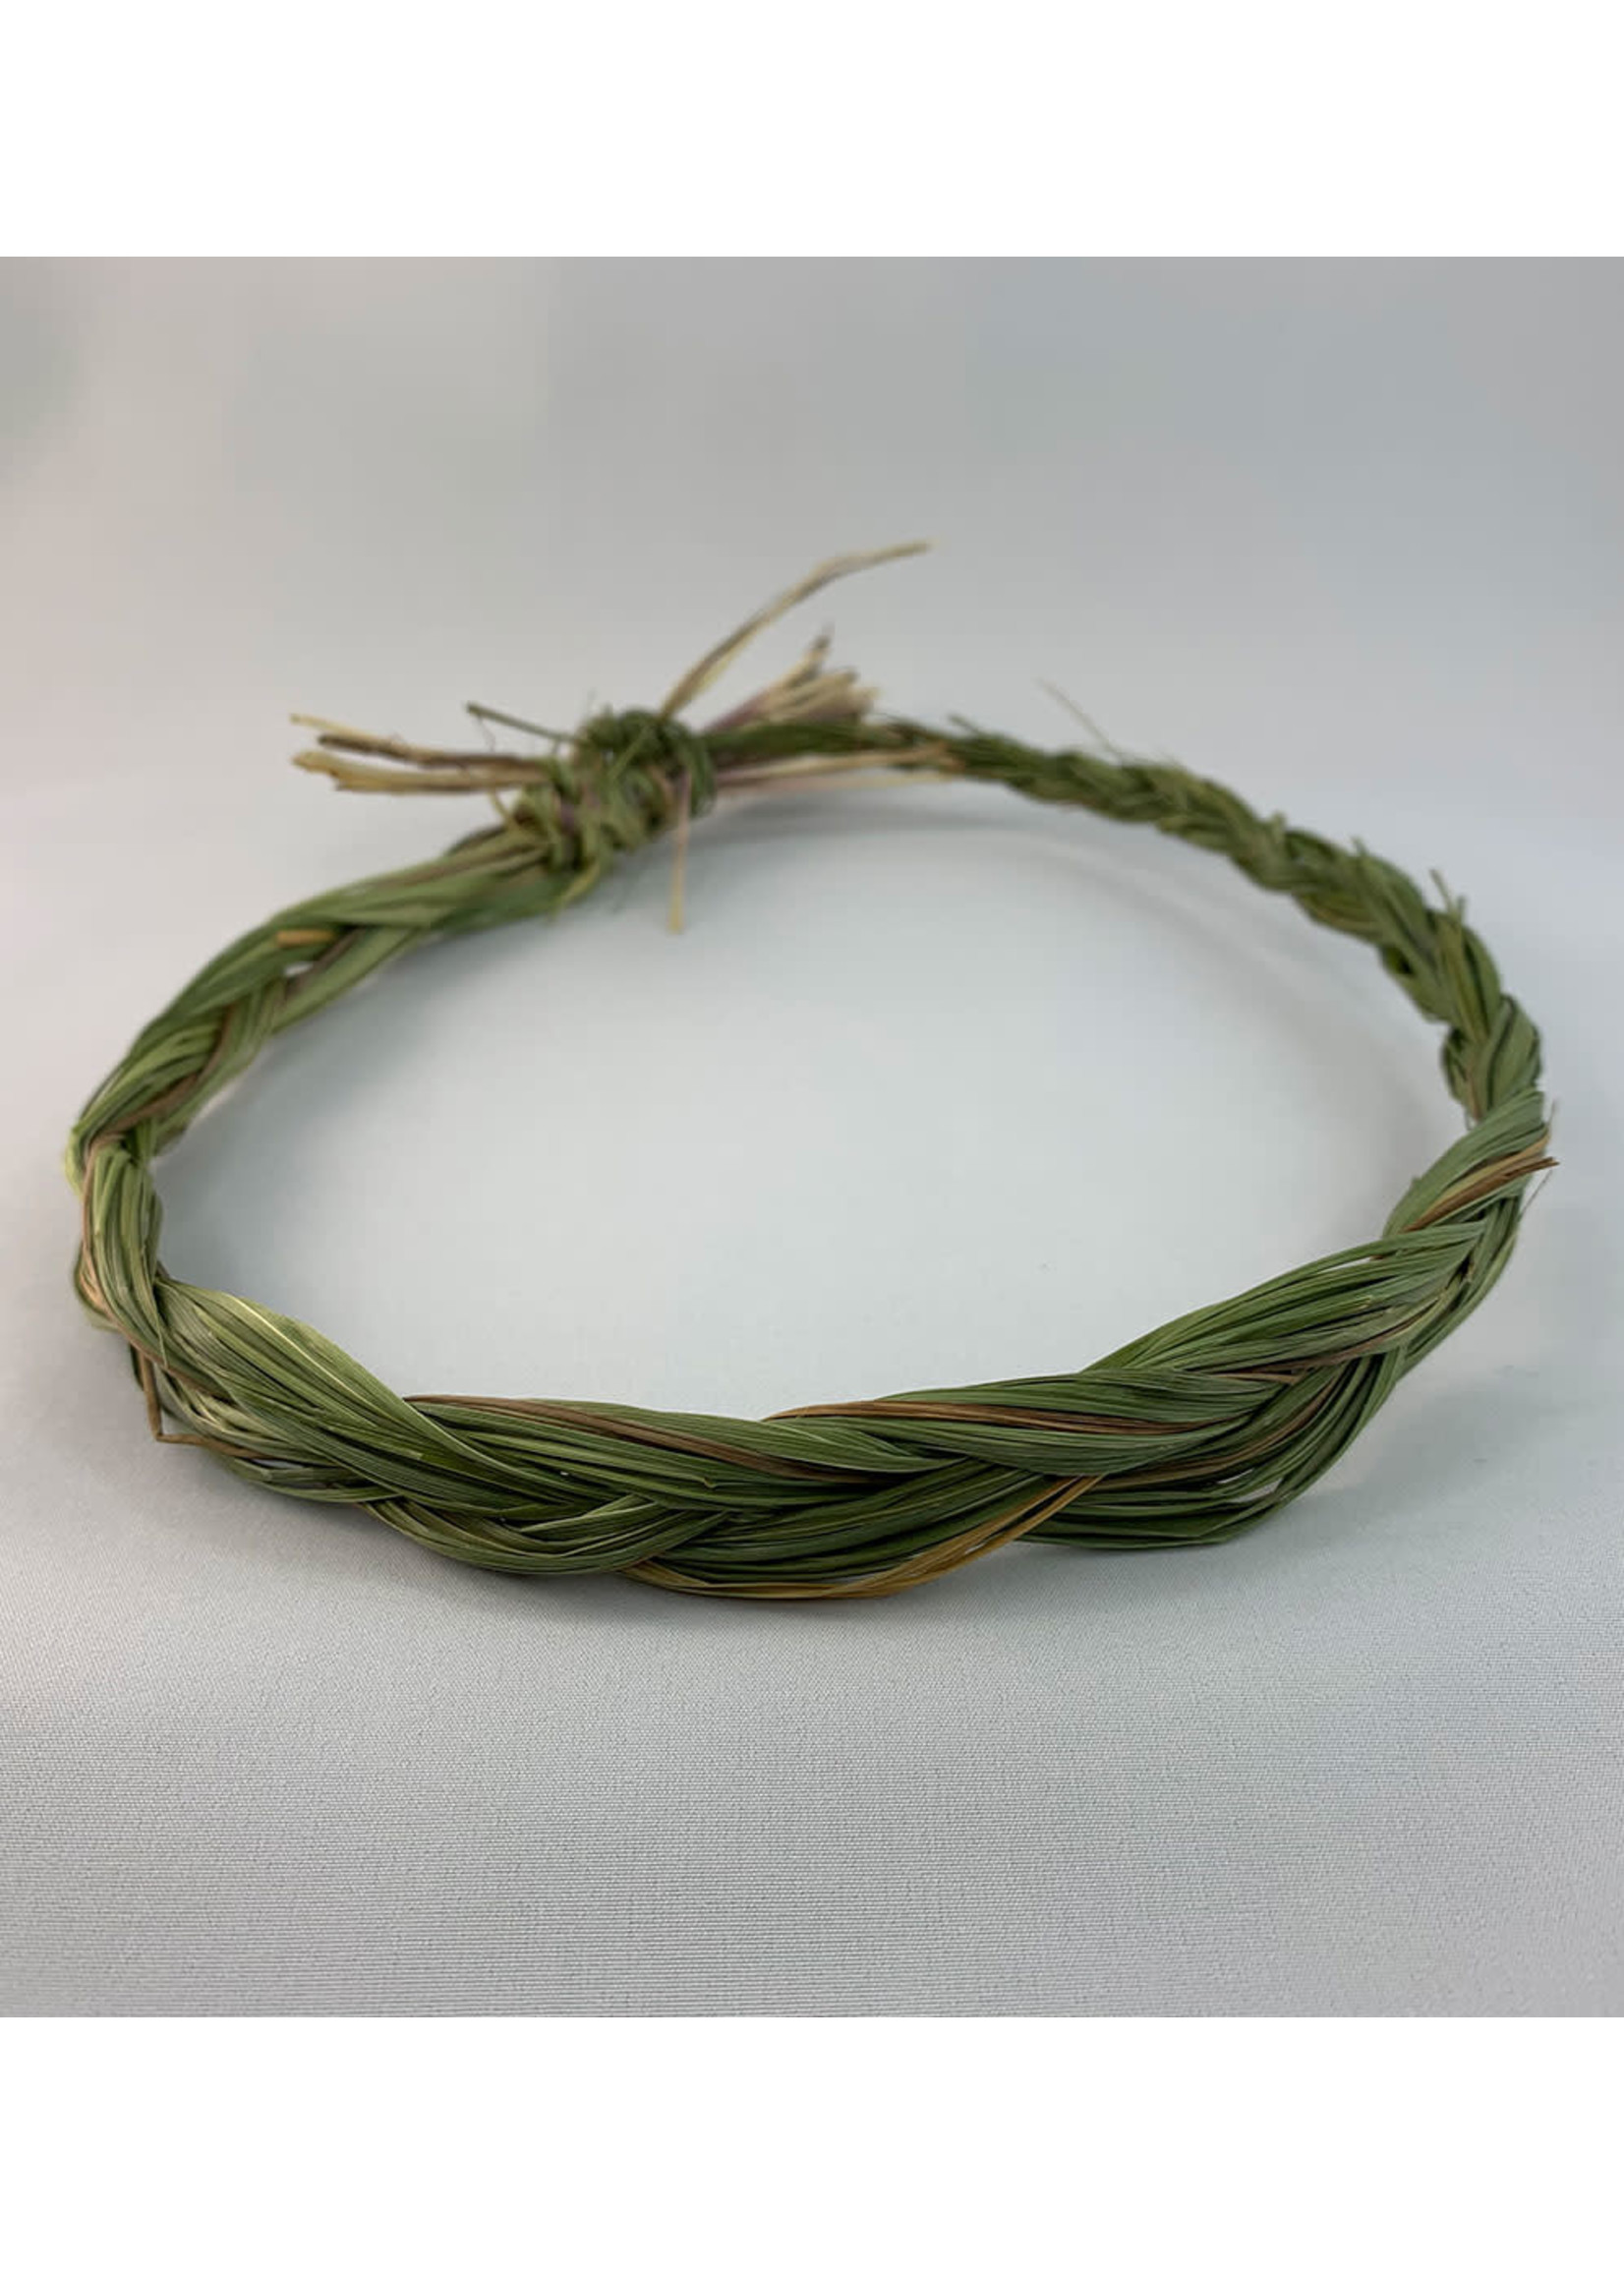 "Circle of Eagles Sweetgrass 24"" braid"